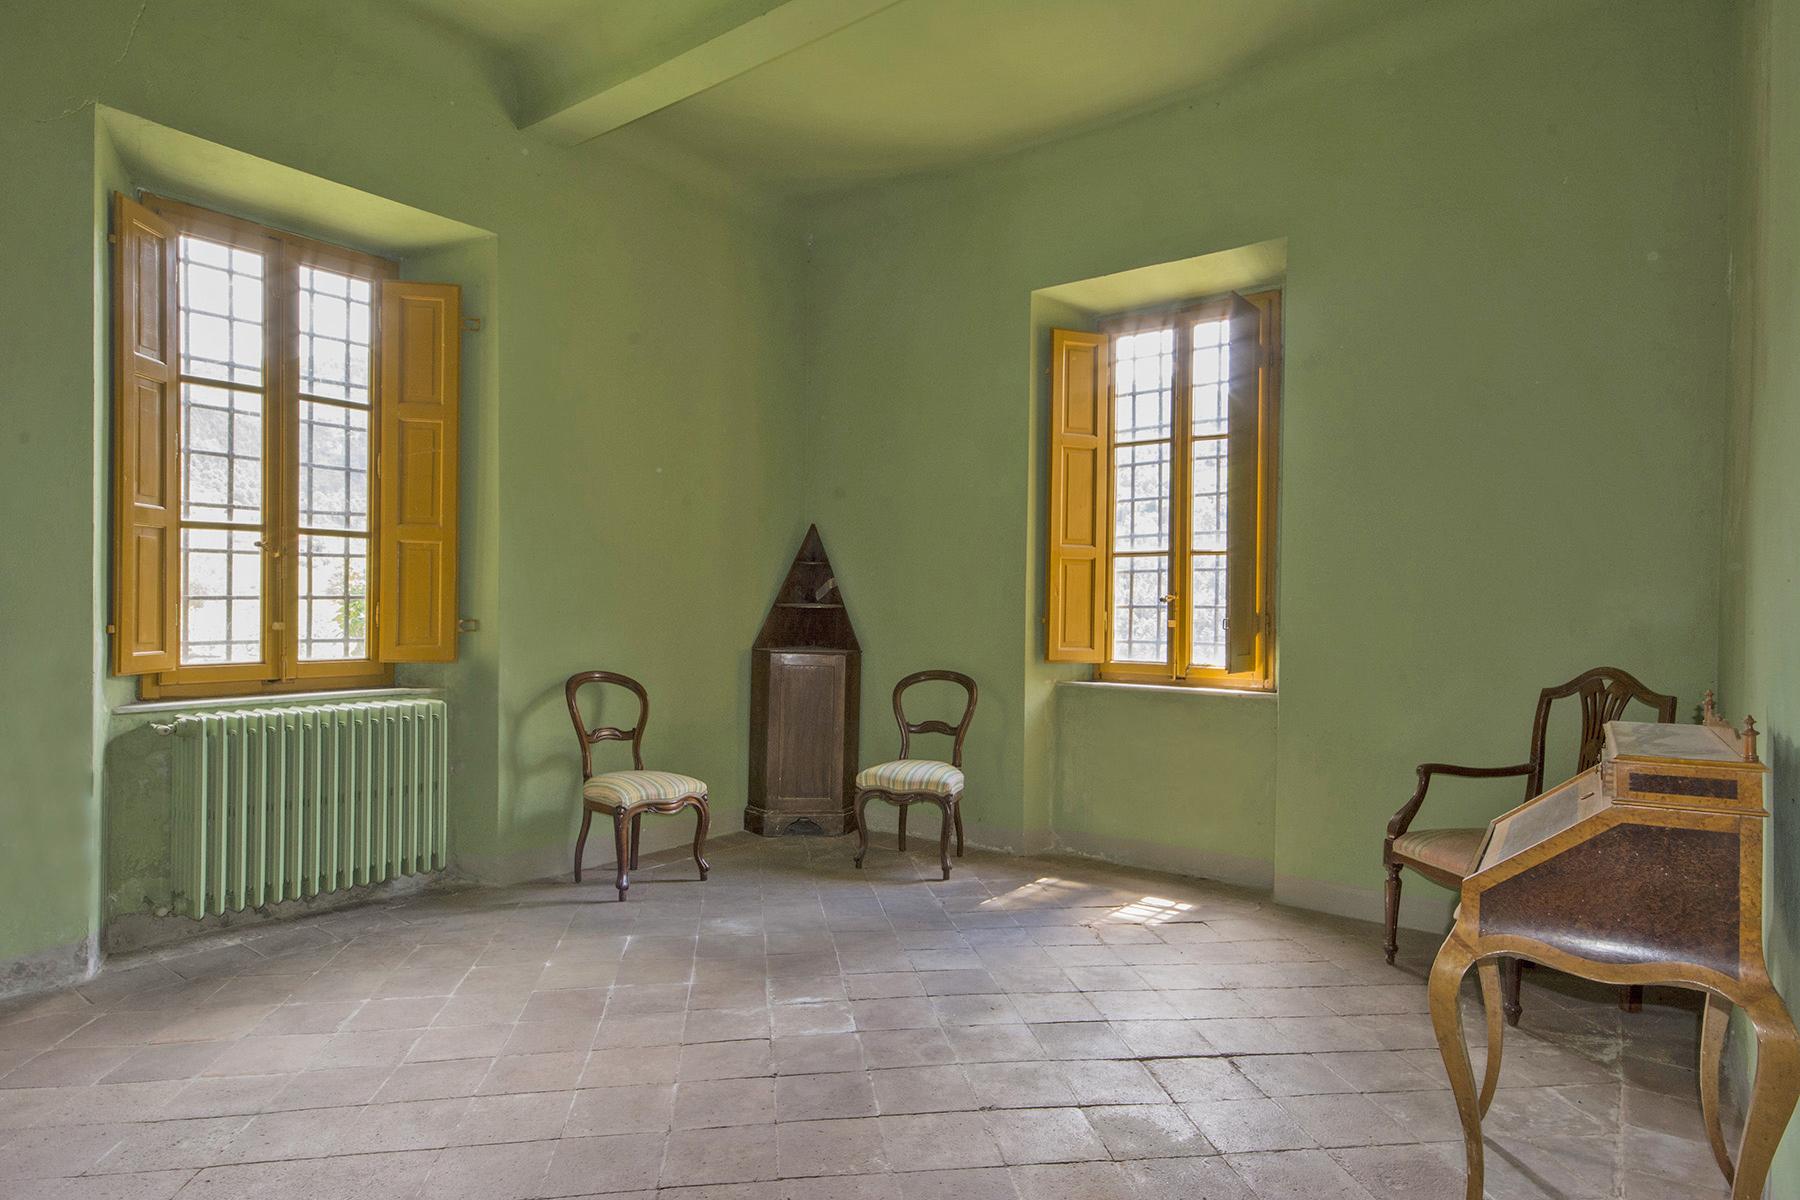 Villa in Vendita a Capannori: 5 locali, 490 mq - Foto 3